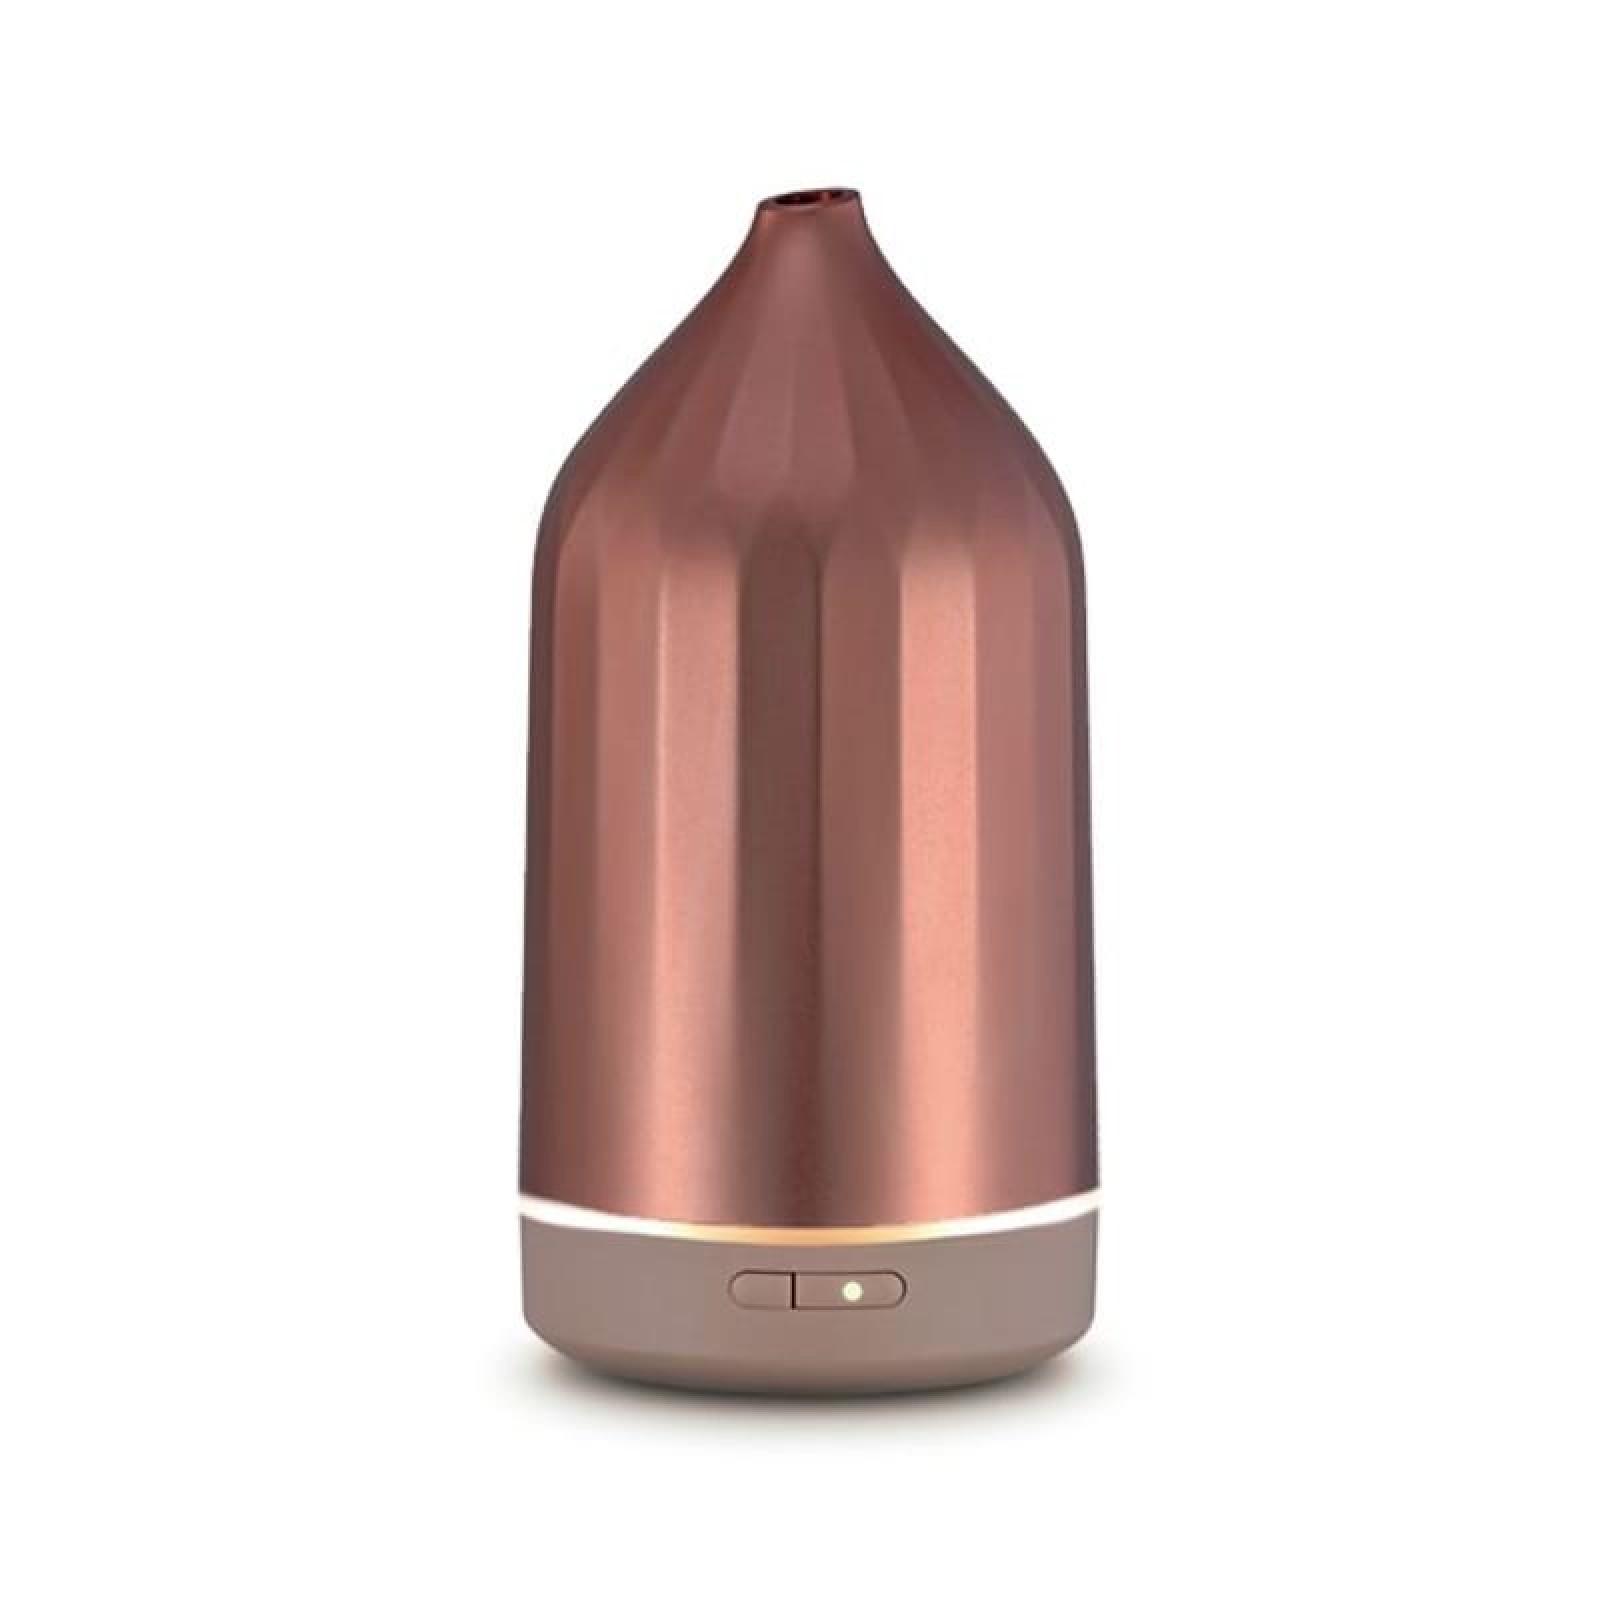 Ridge Ultrasonic Essential Oil Diffuser (Rose Gold) - Toast Living